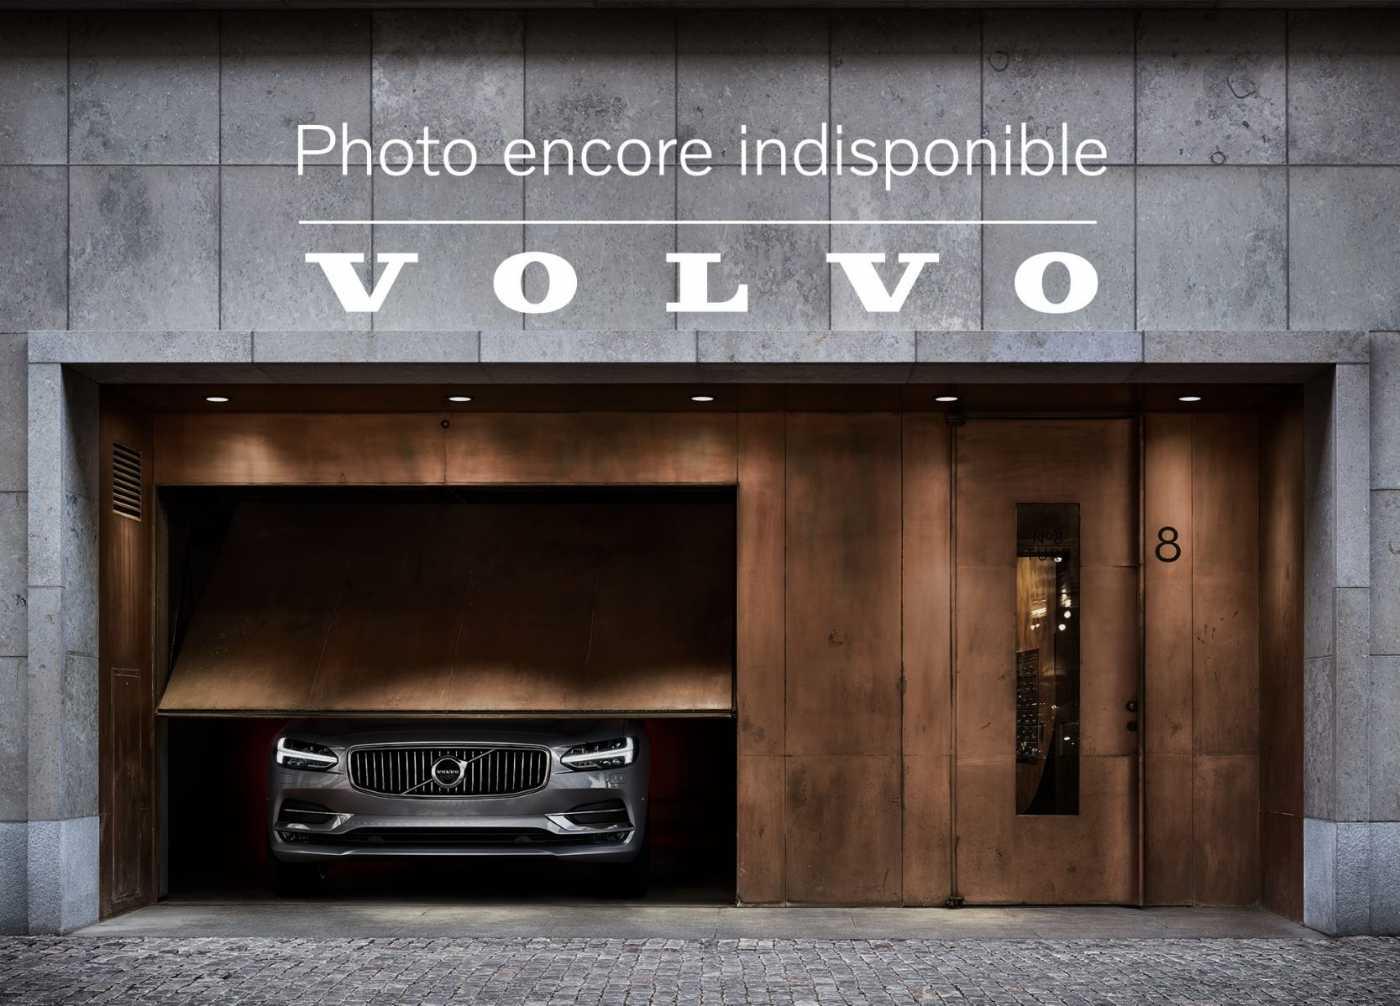 Volvo S60 Inscription T8 Twin Engine eAWD plug-in hybride 2/2